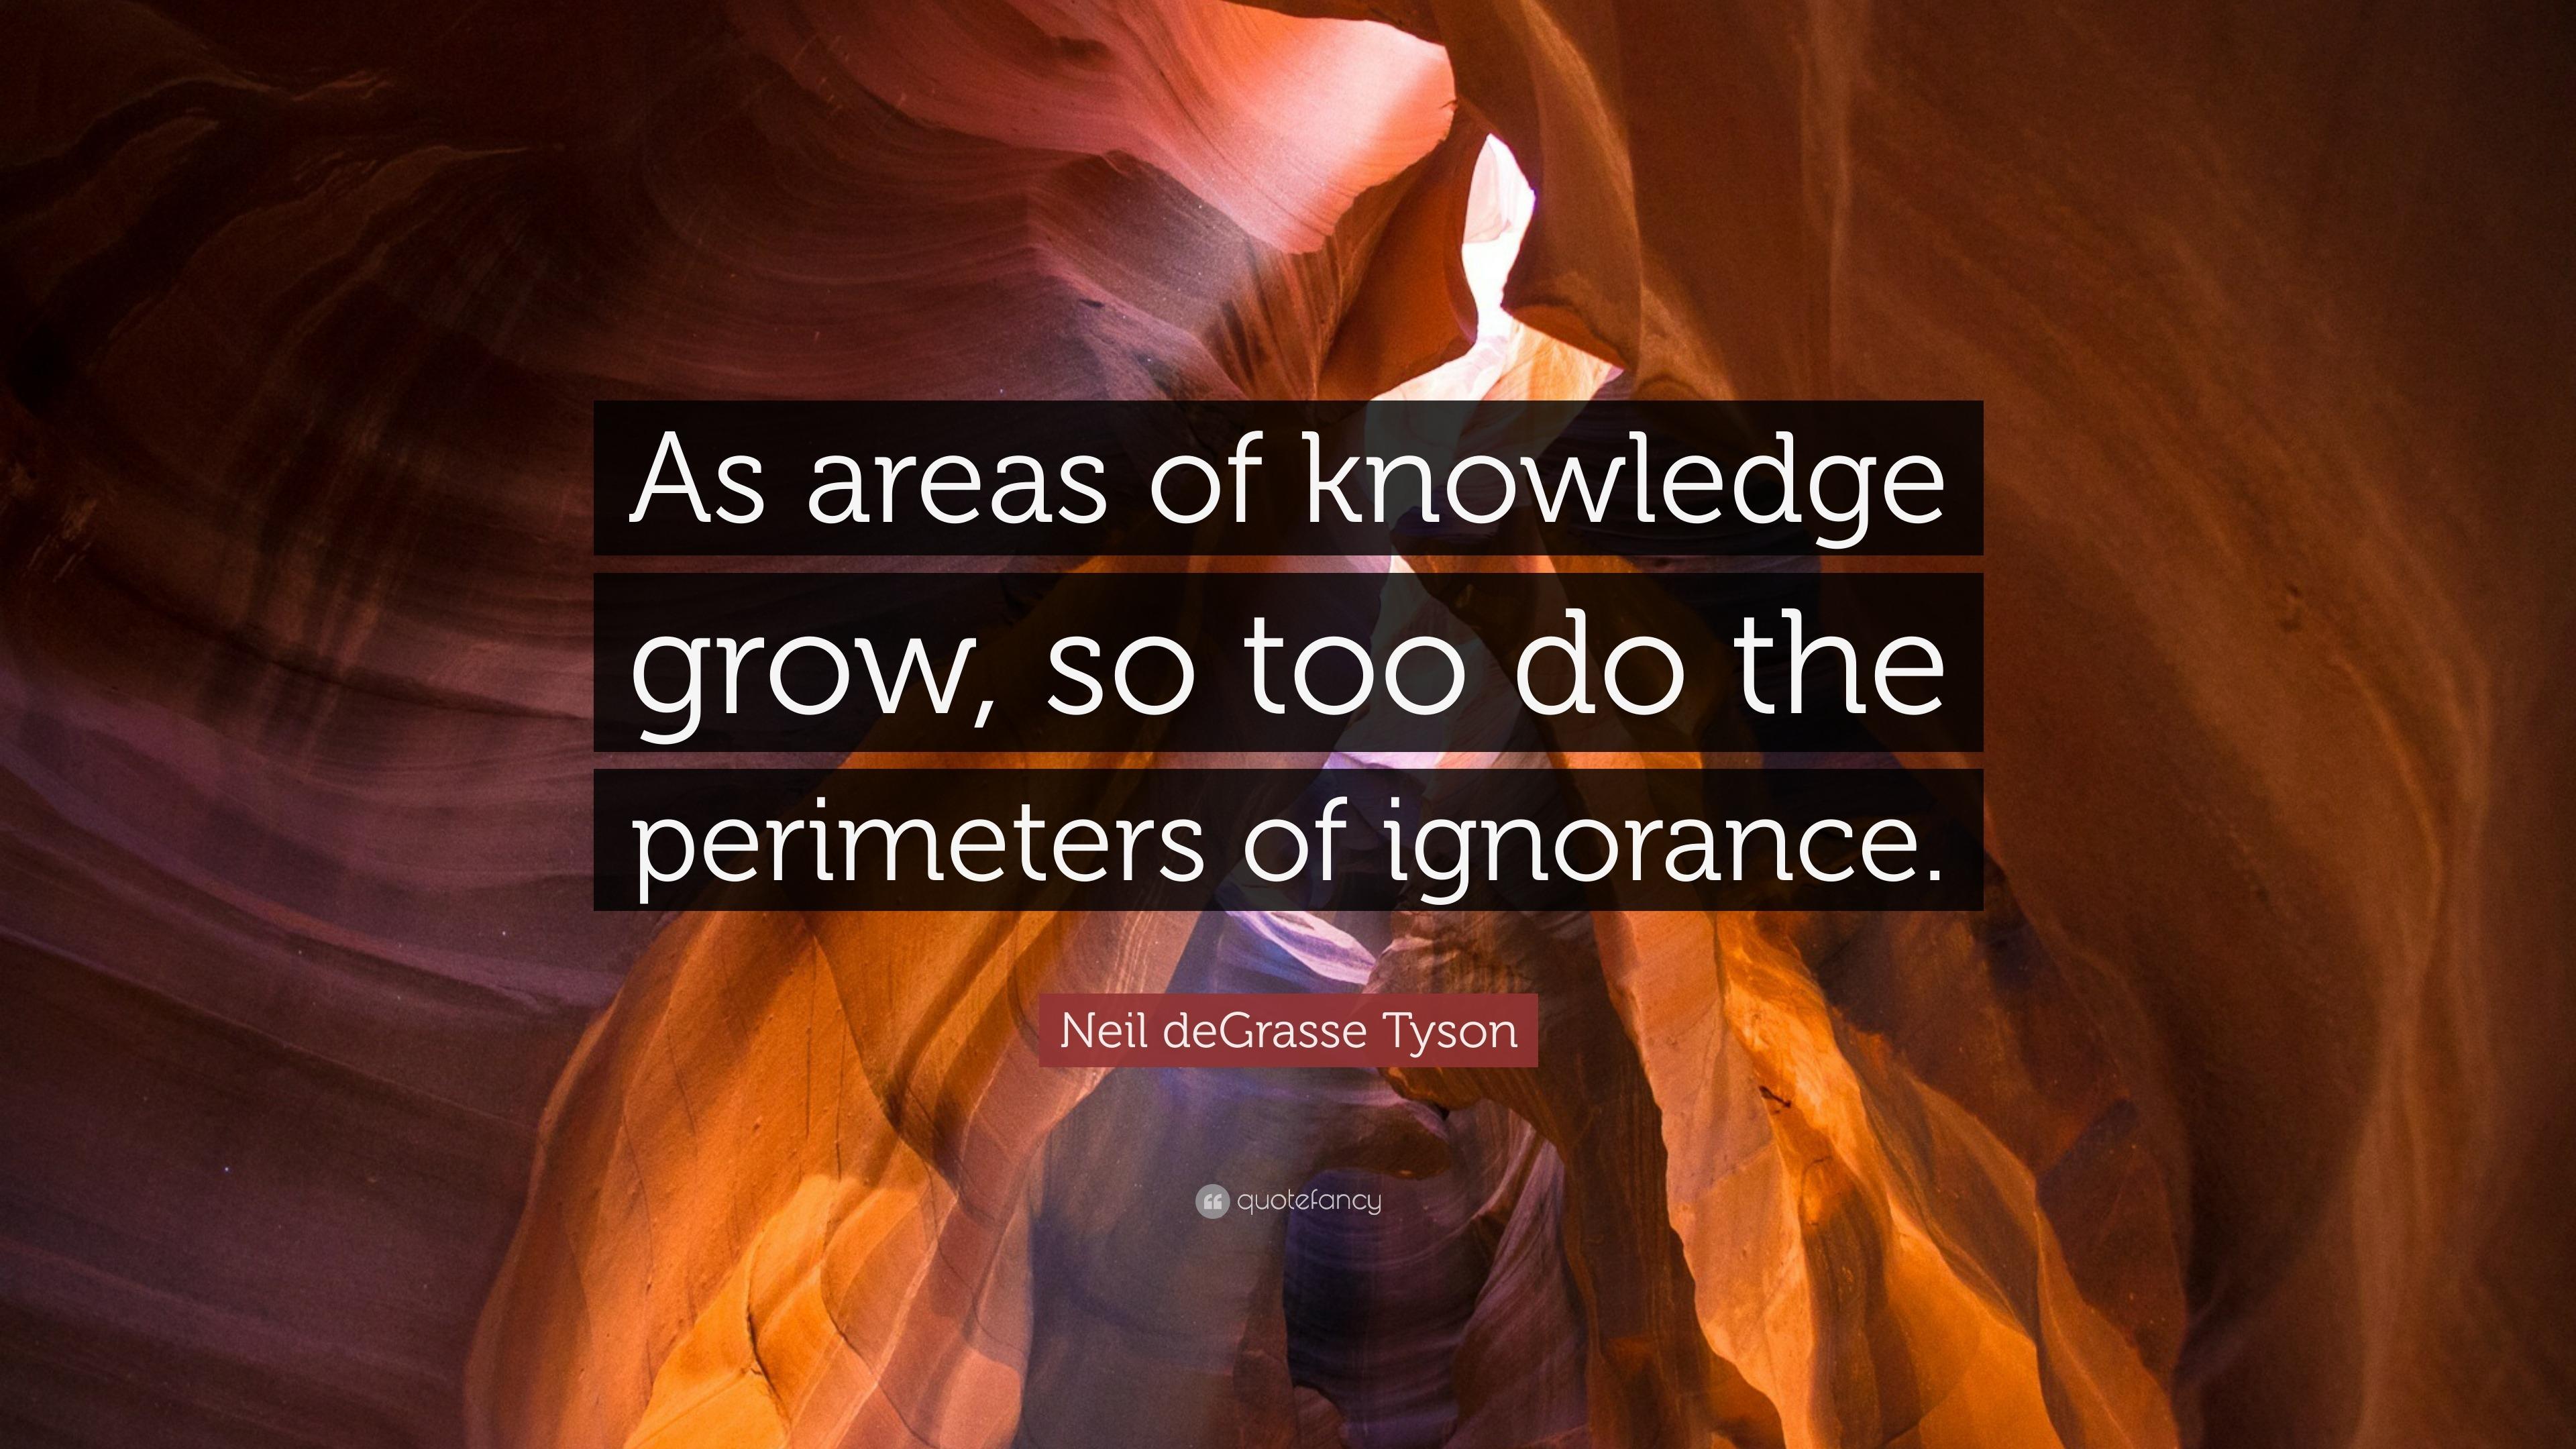 The perimeter of ignorance